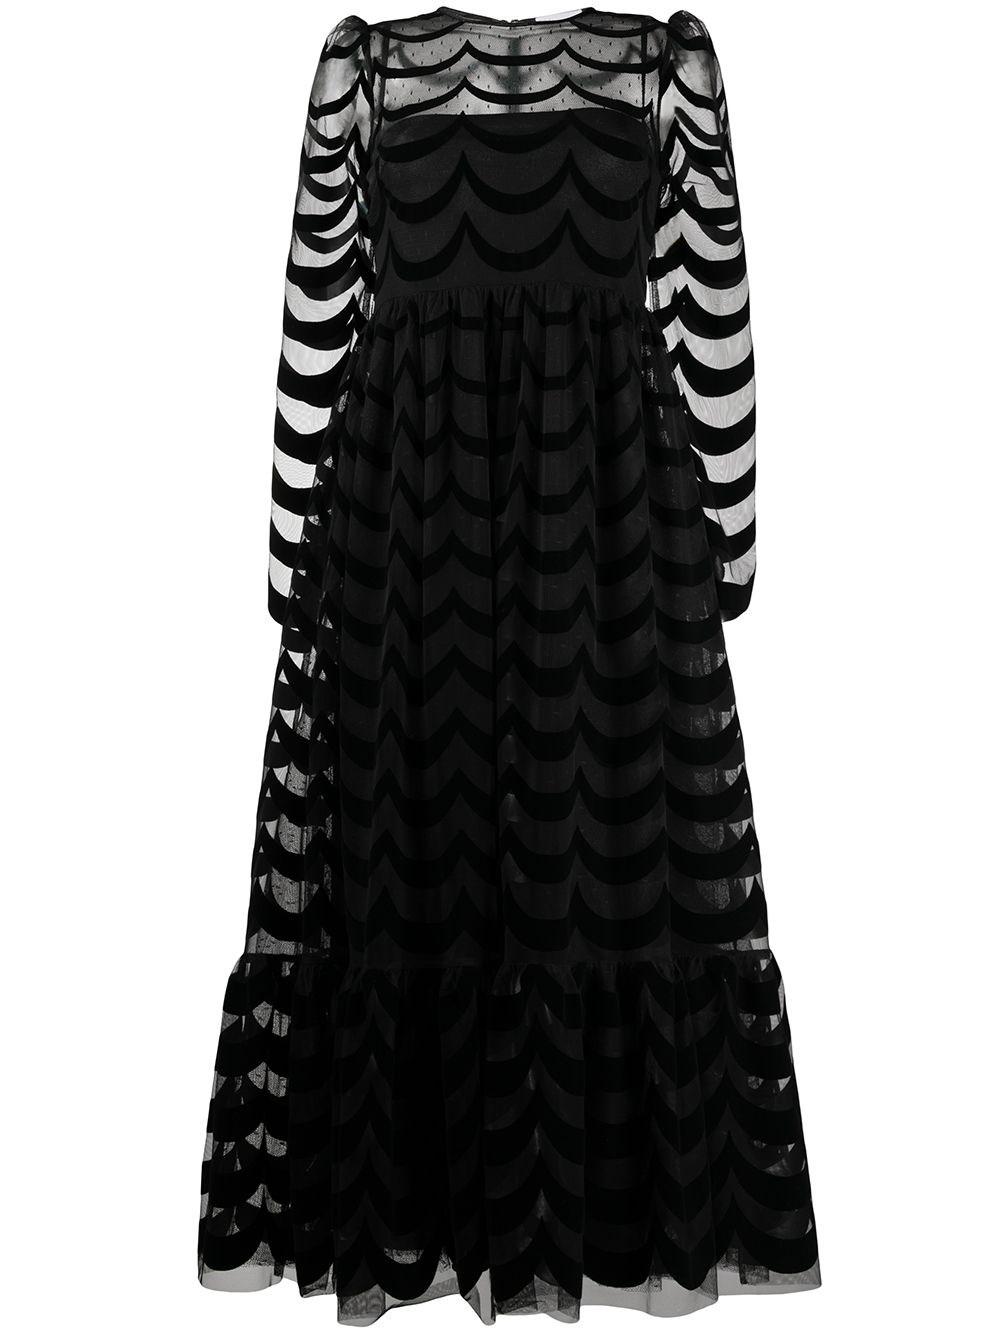 REDVALENTINO Black Maxi Dress